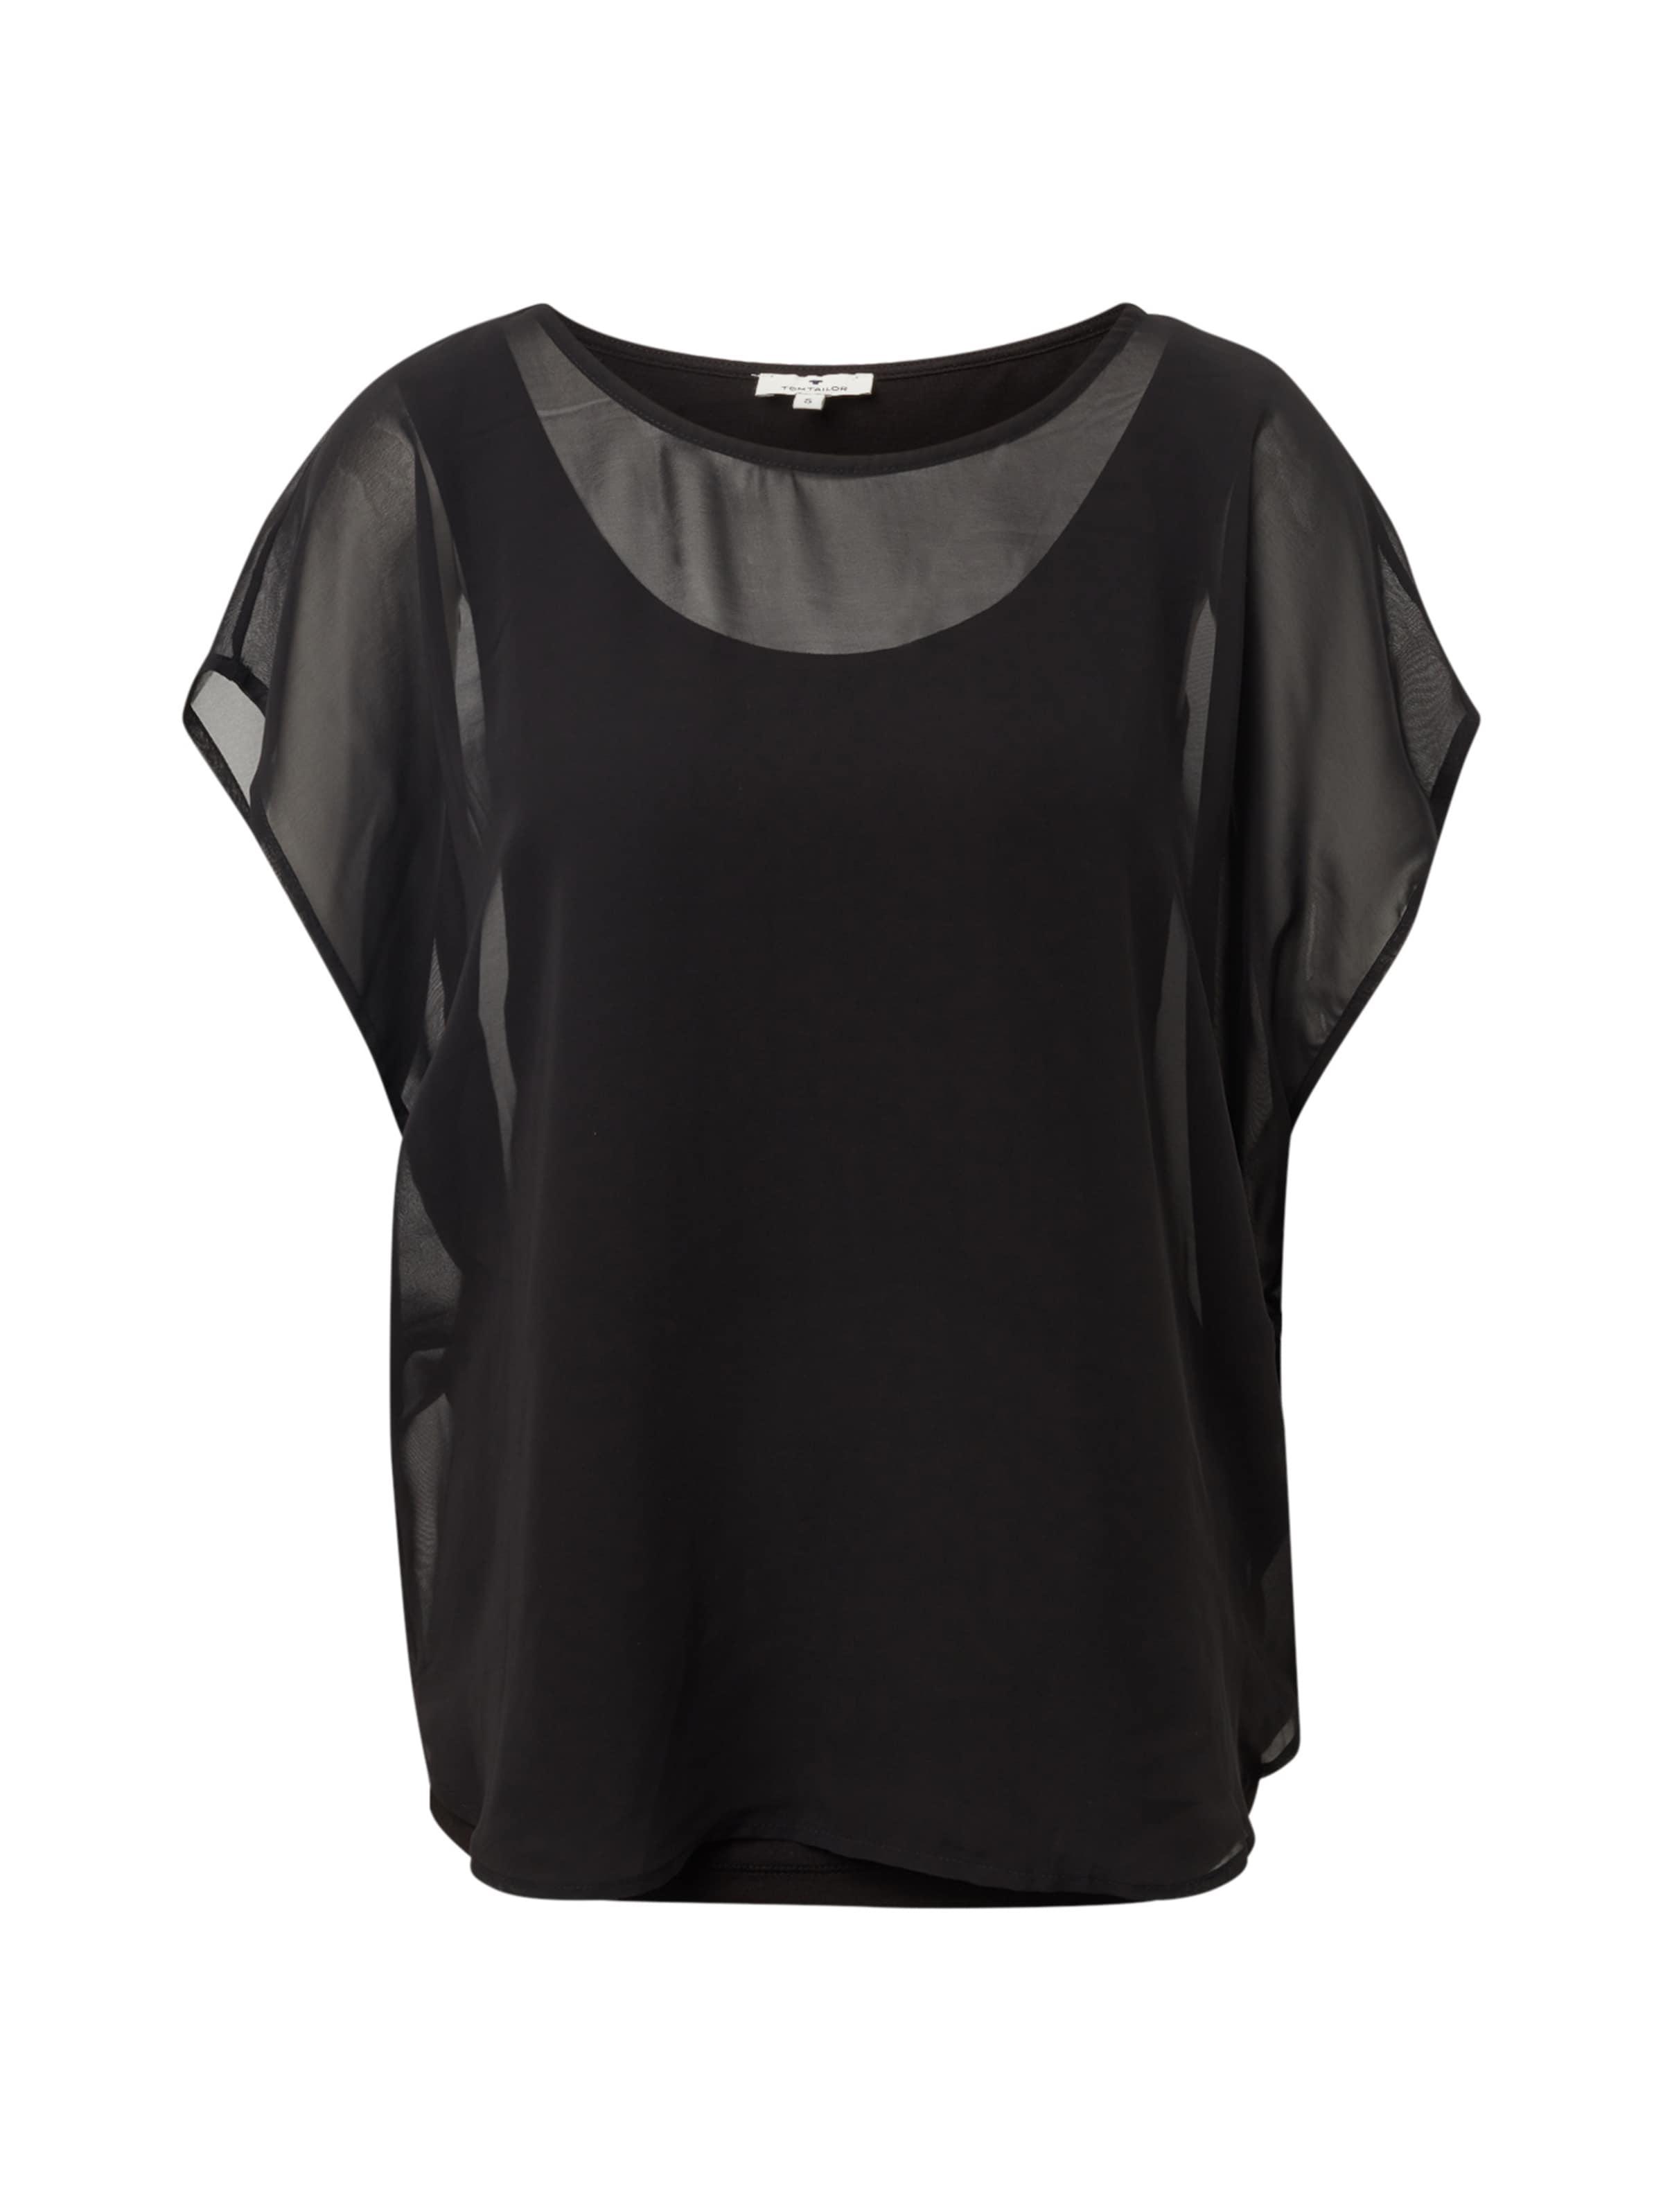 In Schwarz Tom T Tailor shirt F1clTKJ3